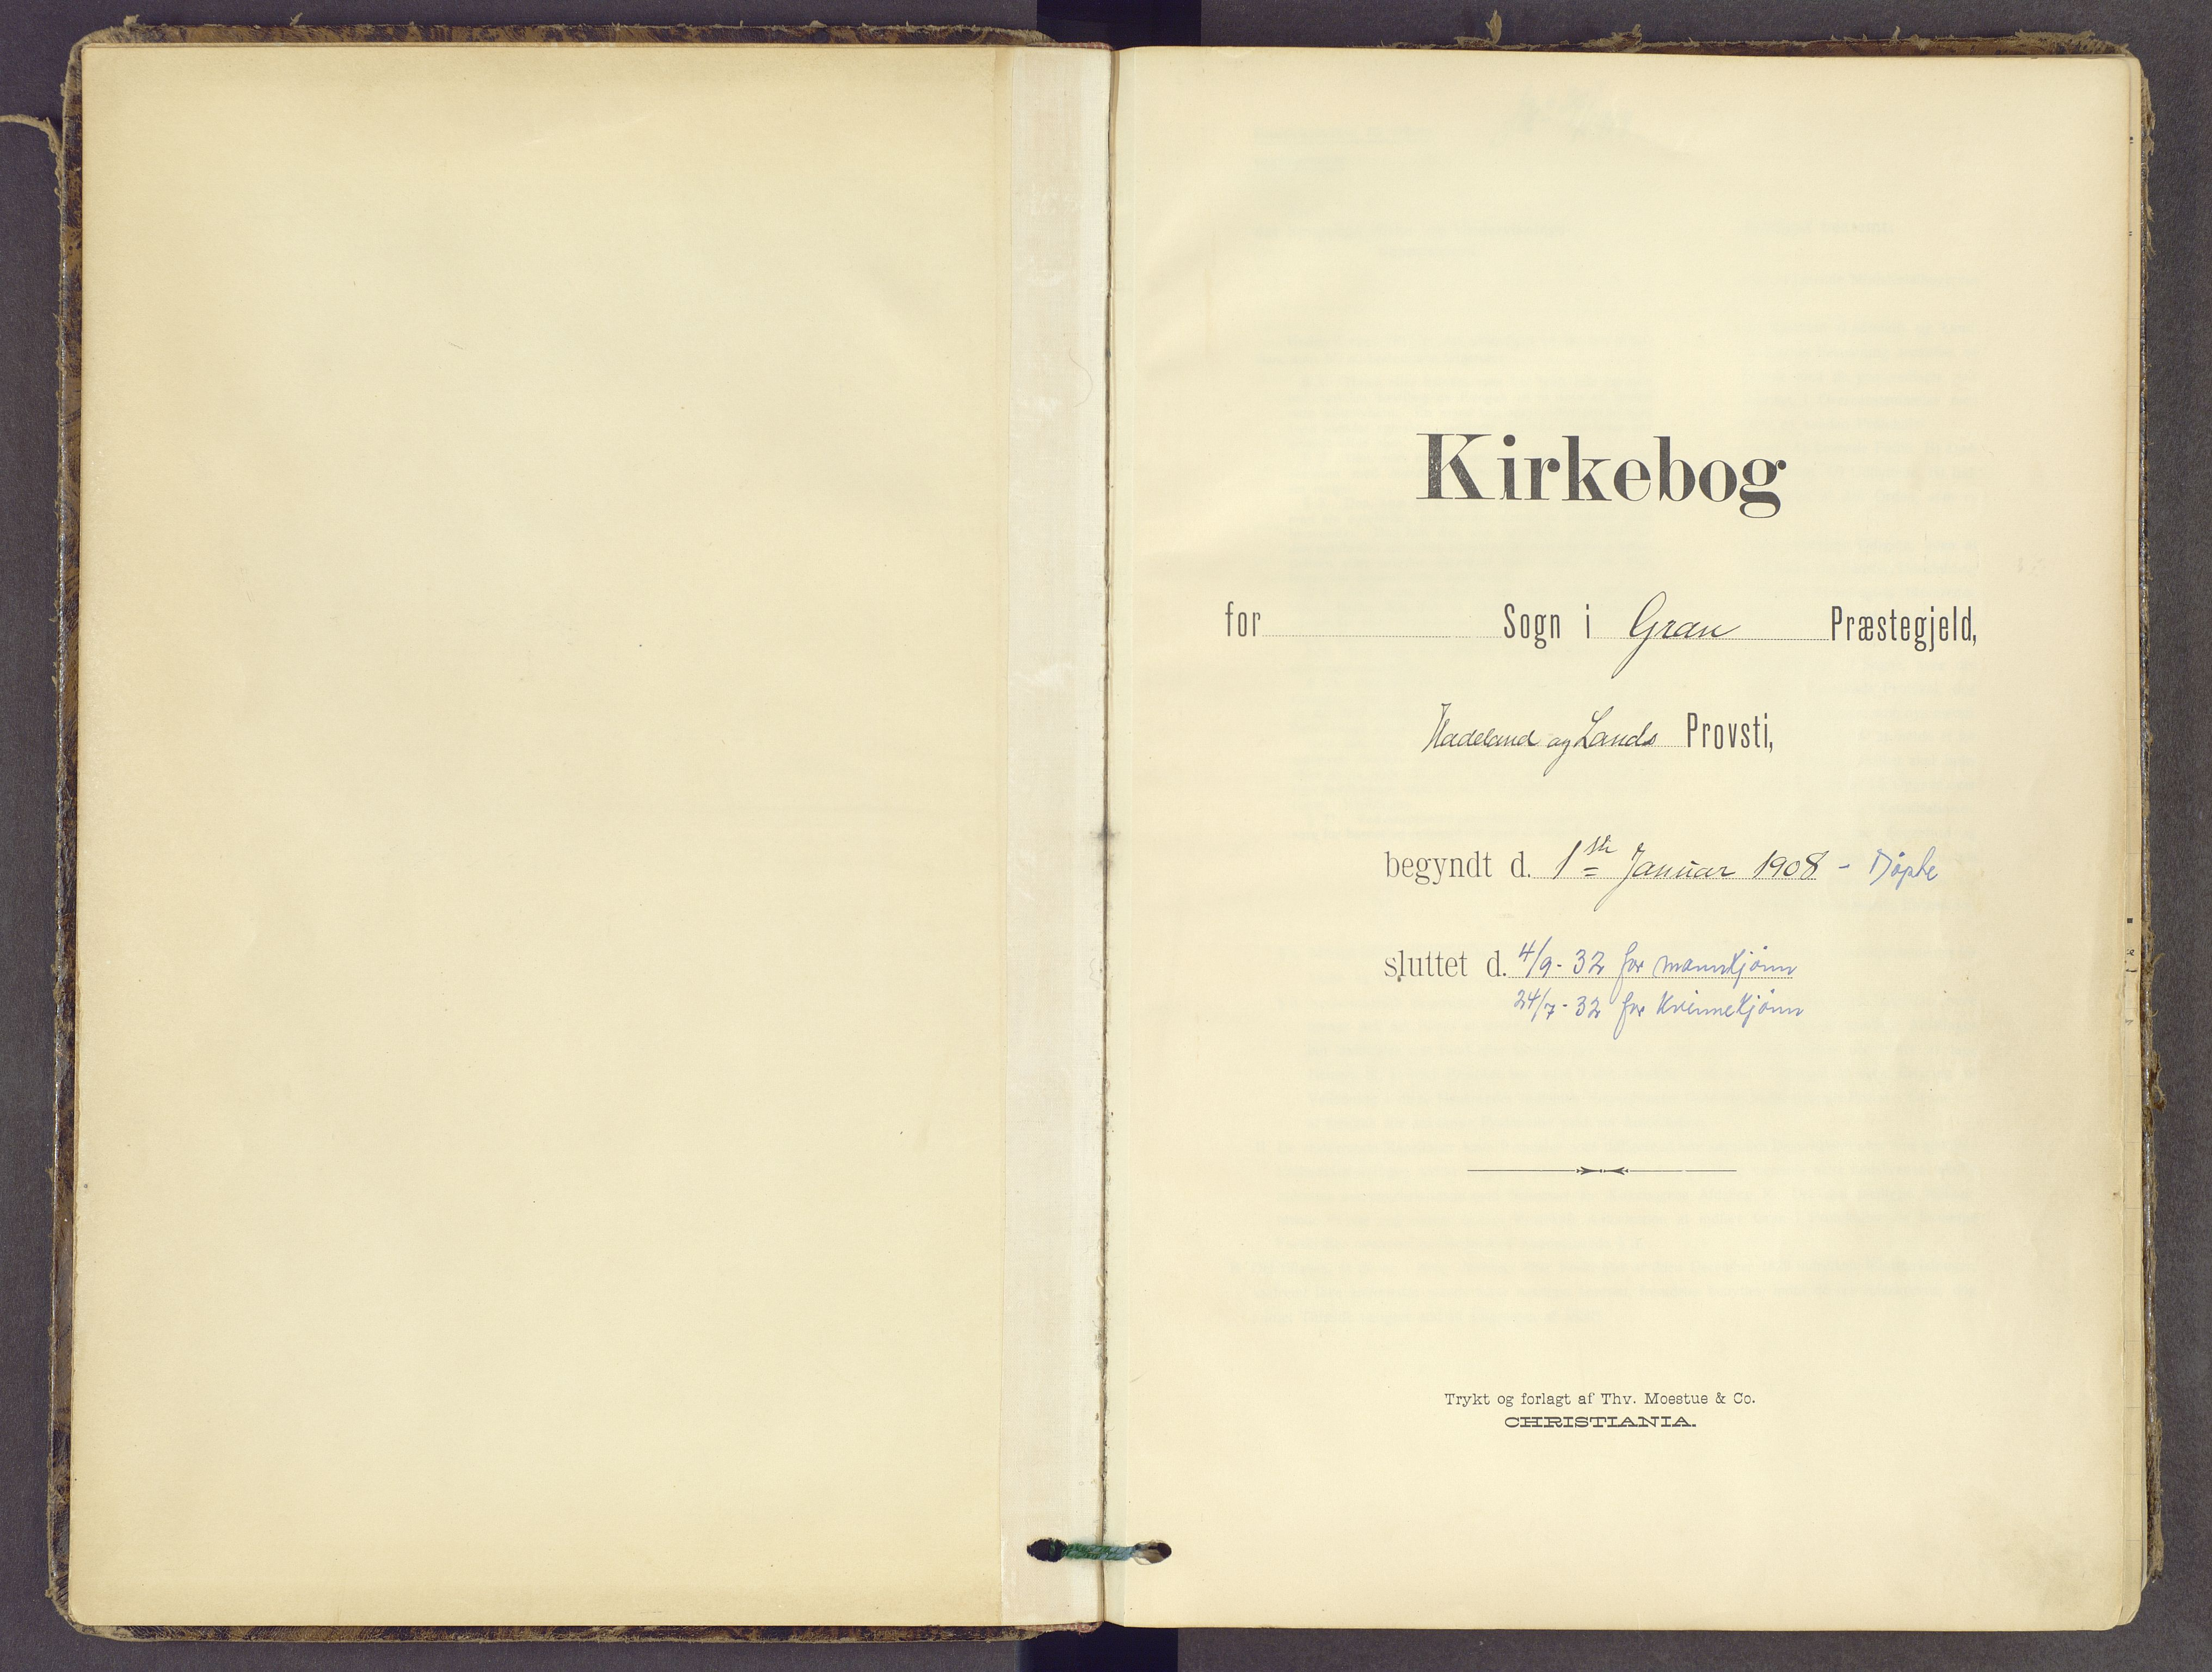 SAH, Gran prestekontor, Ministerialbok nr. 21, 1908-1932